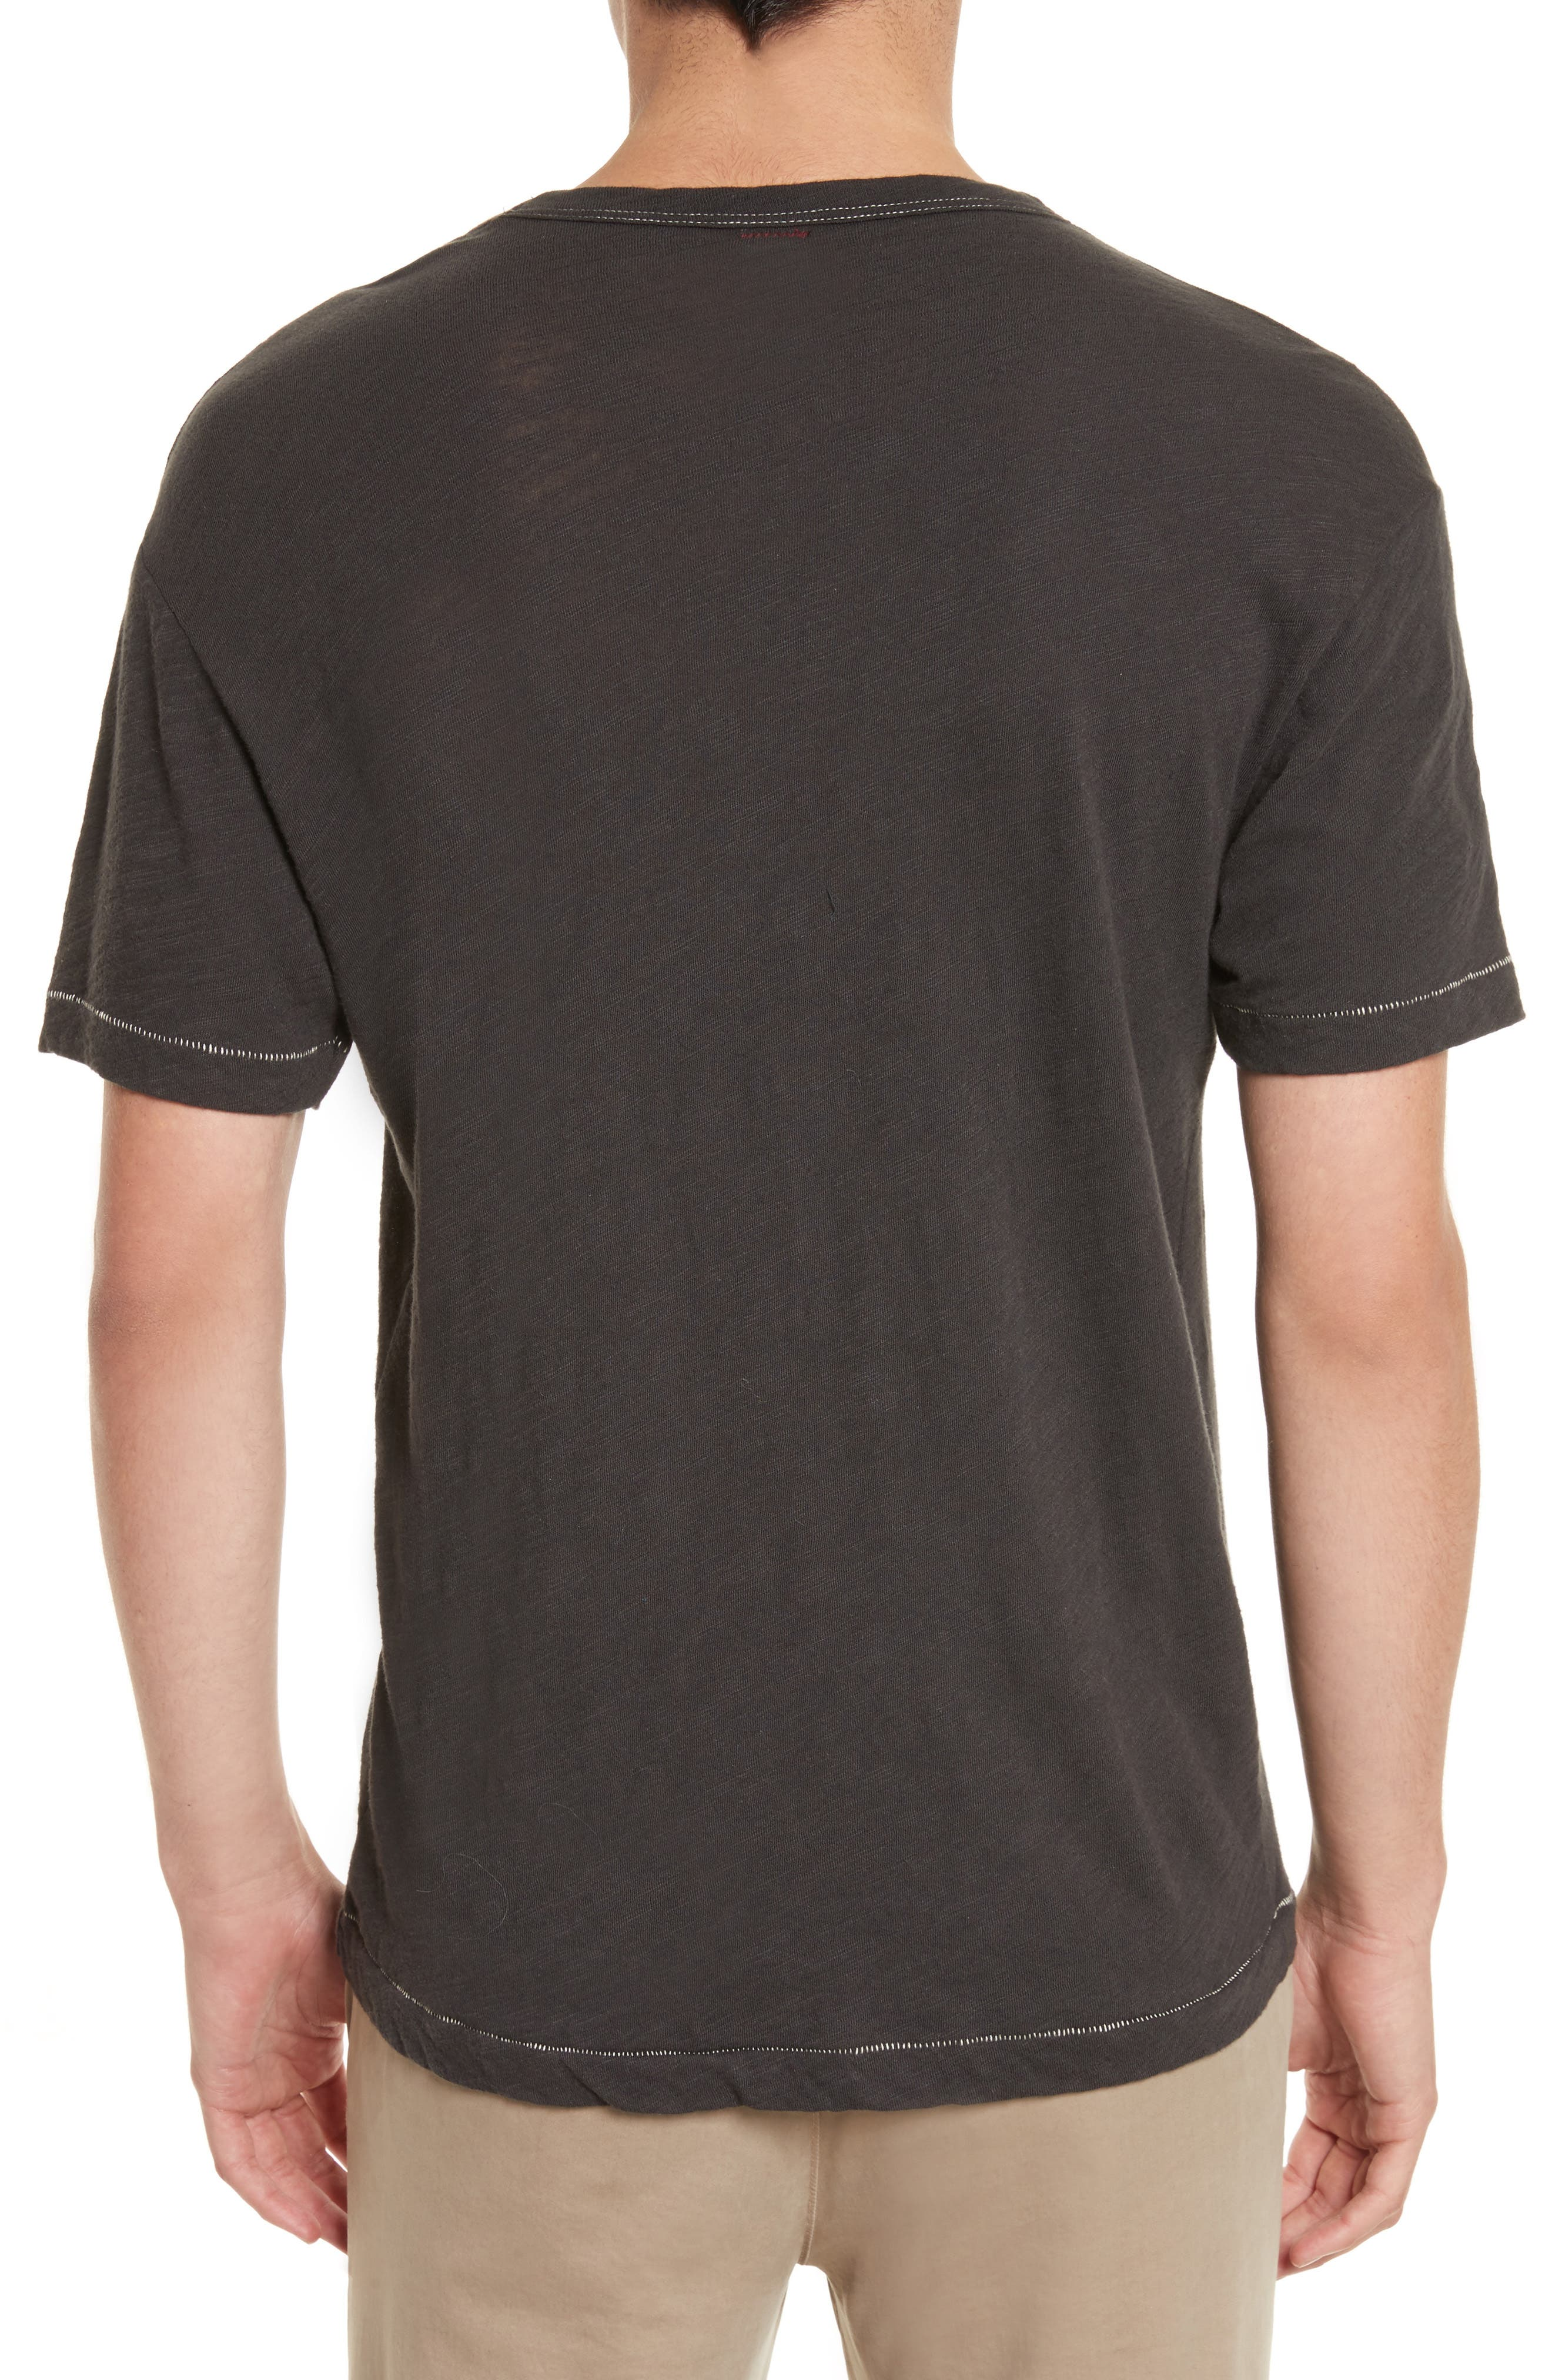 New York T-Shirt,                             Alternate thumbnail 2, color,                             001